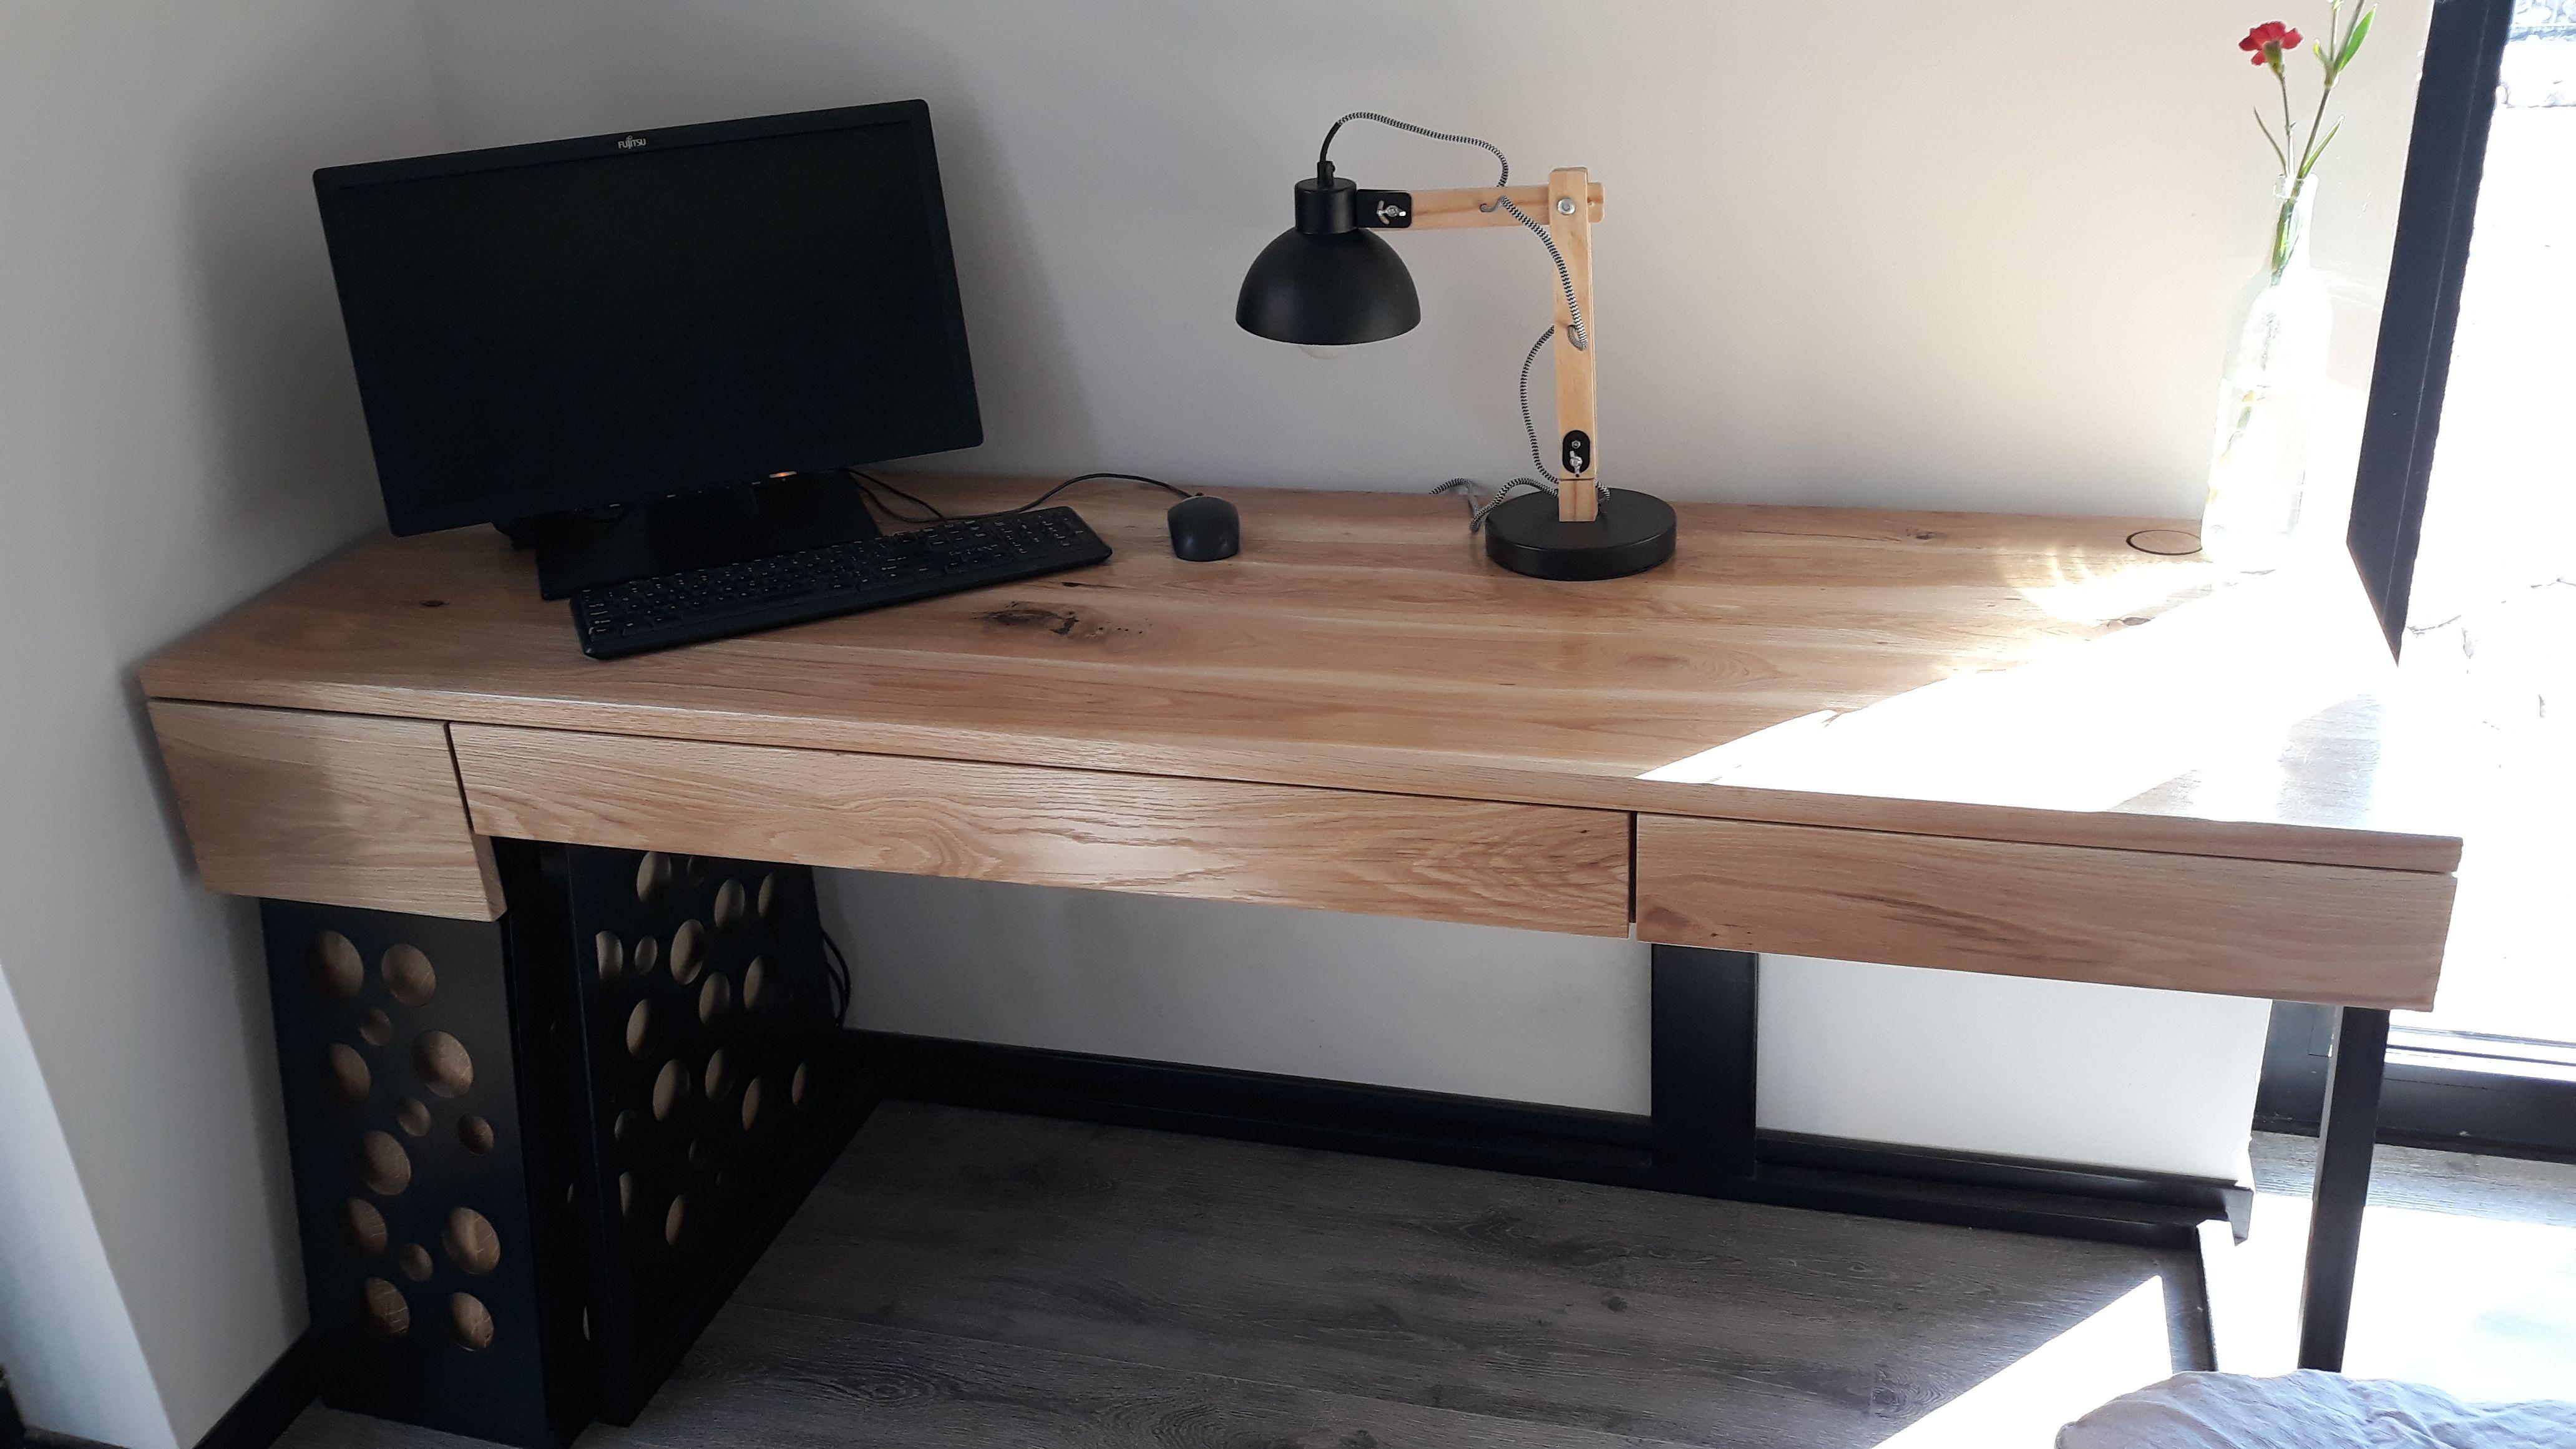 Biurko Zabudowa Komputera Forma Minimal Minimalism Industrialdesign Naturalwooddesk Home Decor Corner Desk Work Room